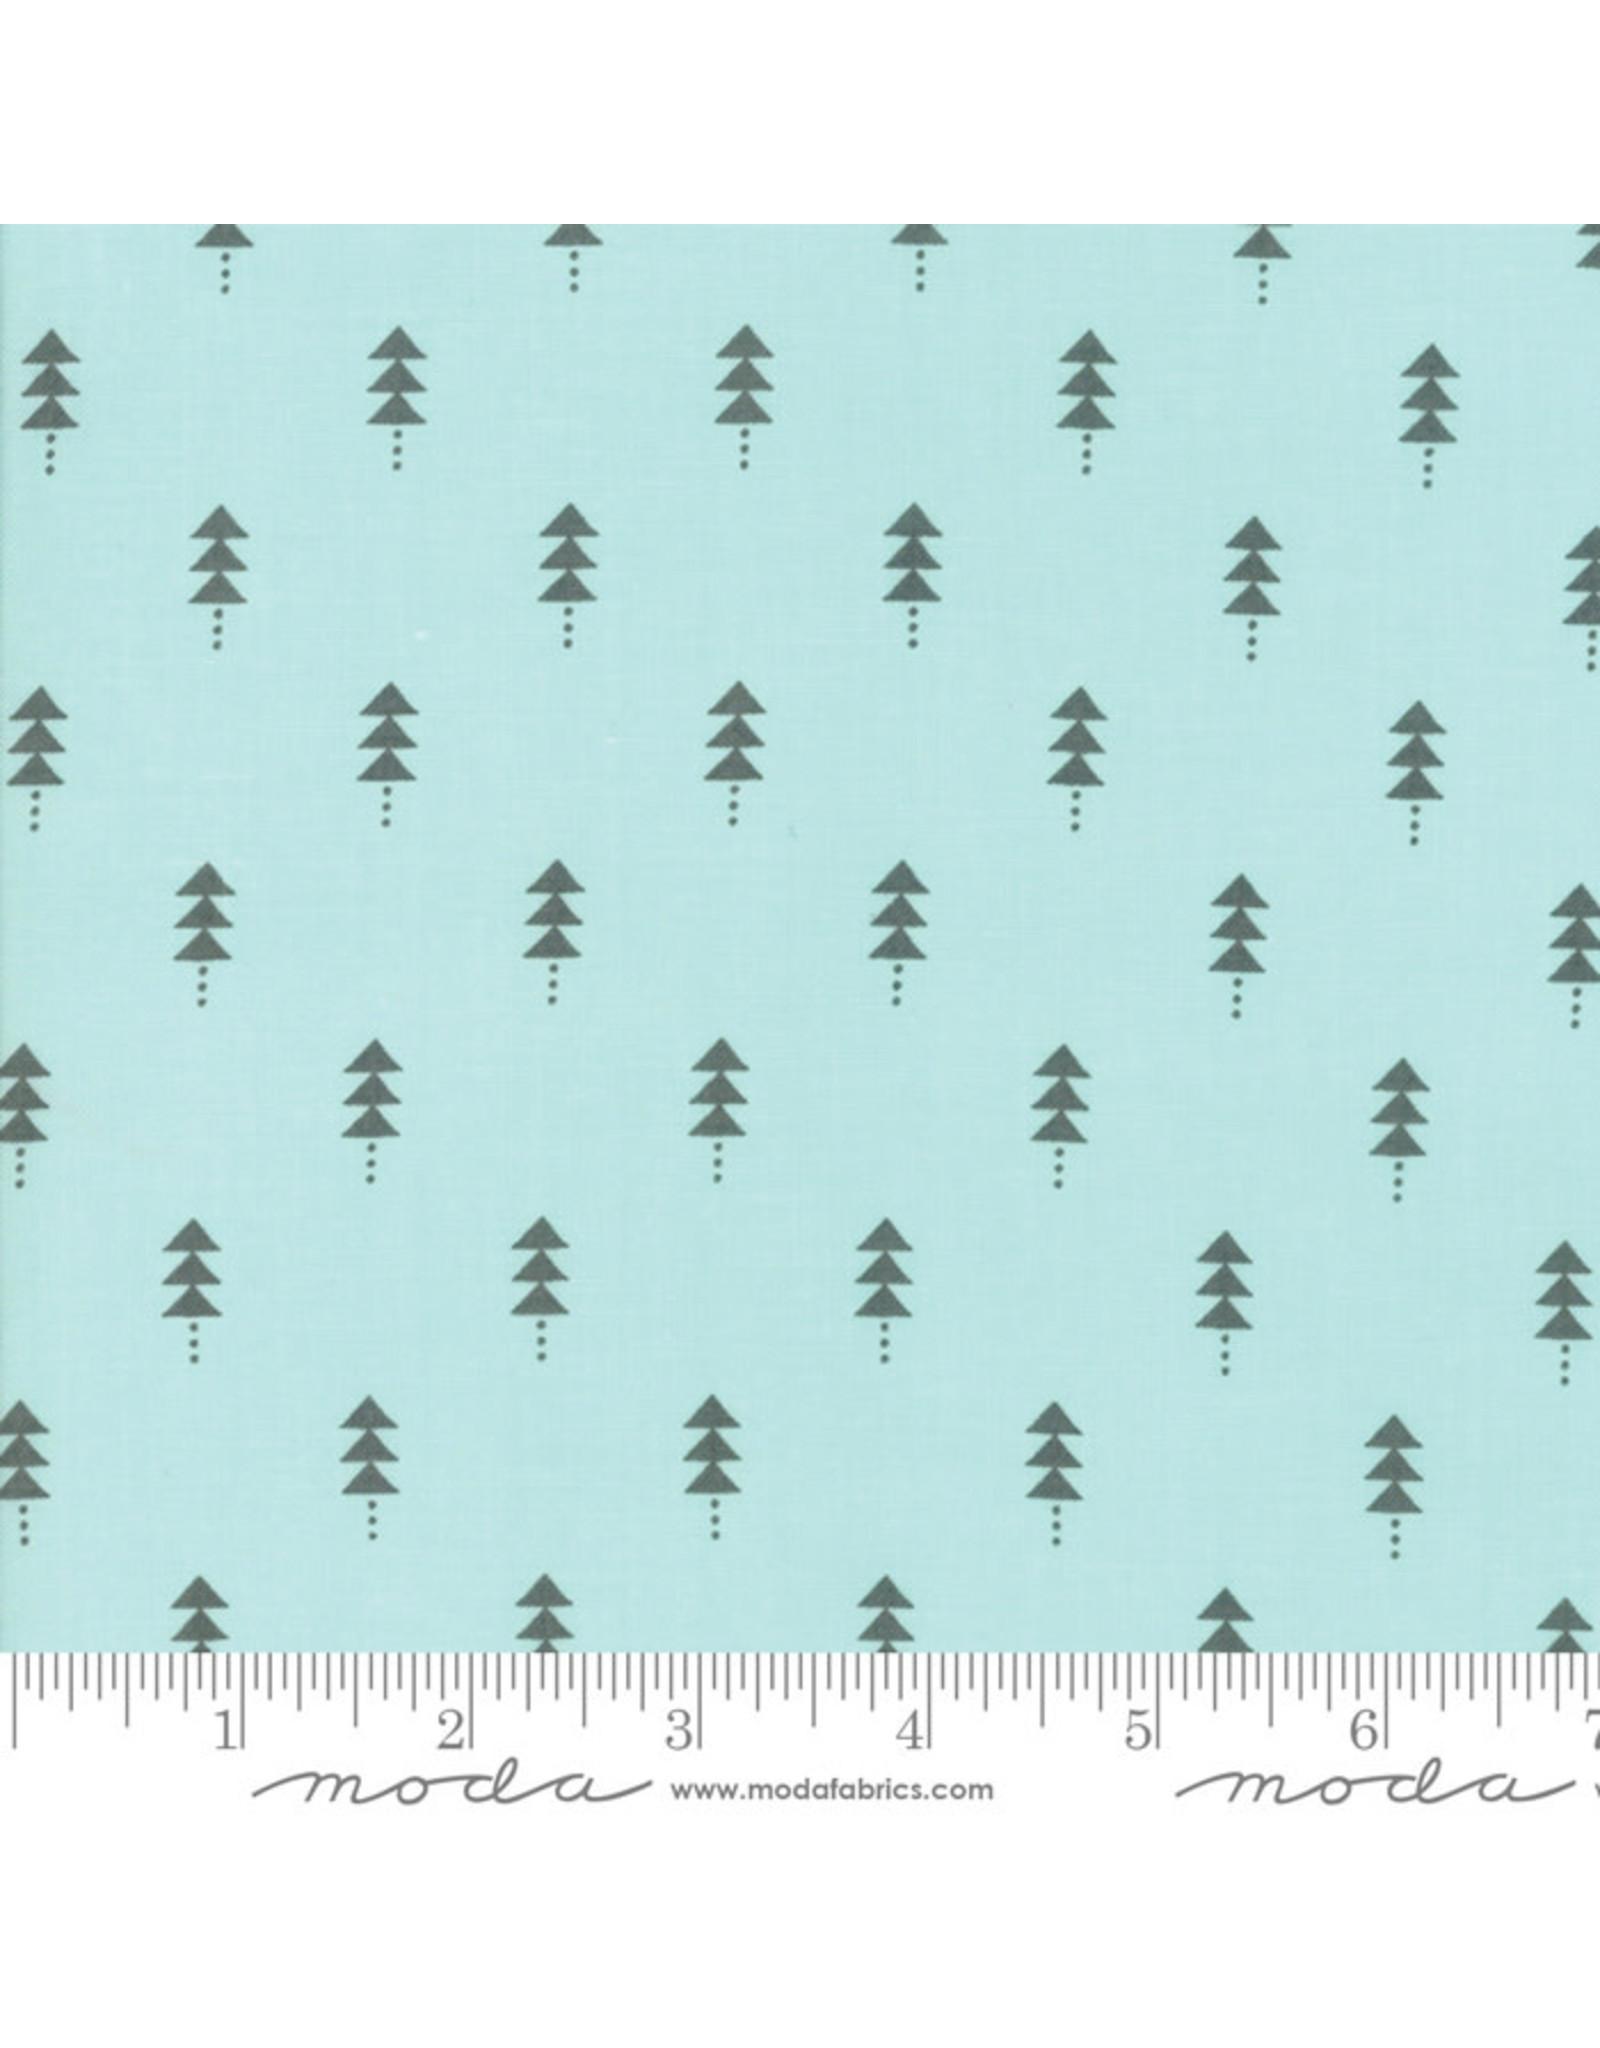 Moda Little Tree - Little Trees Aqua